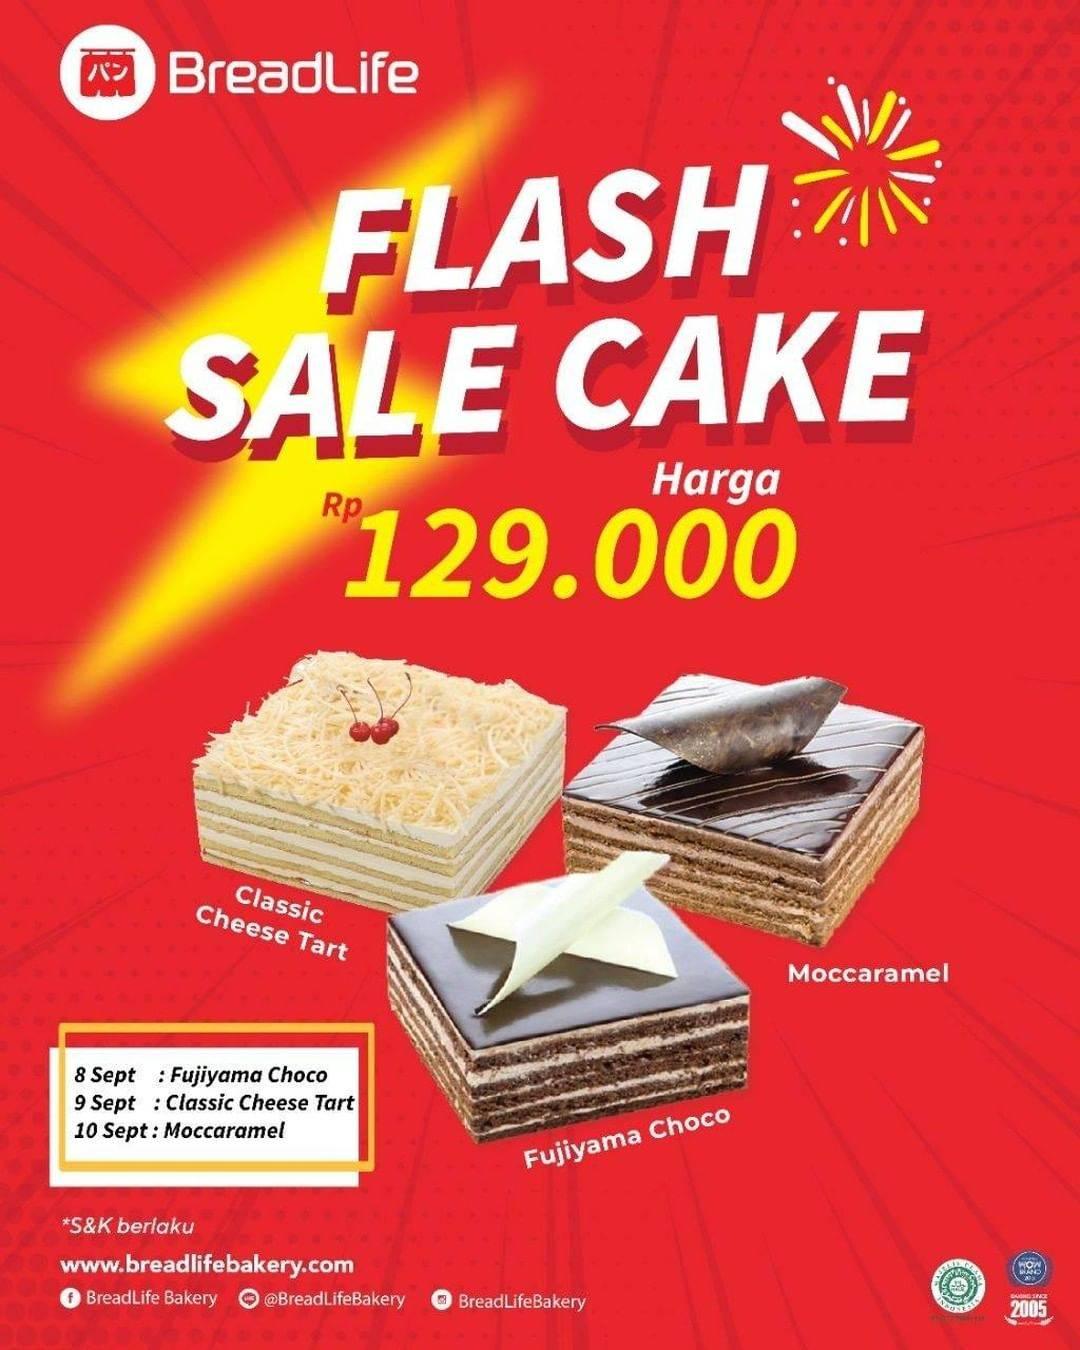 Diskon Breadlife Flash Sale Cake Hanya Rp. 129.000